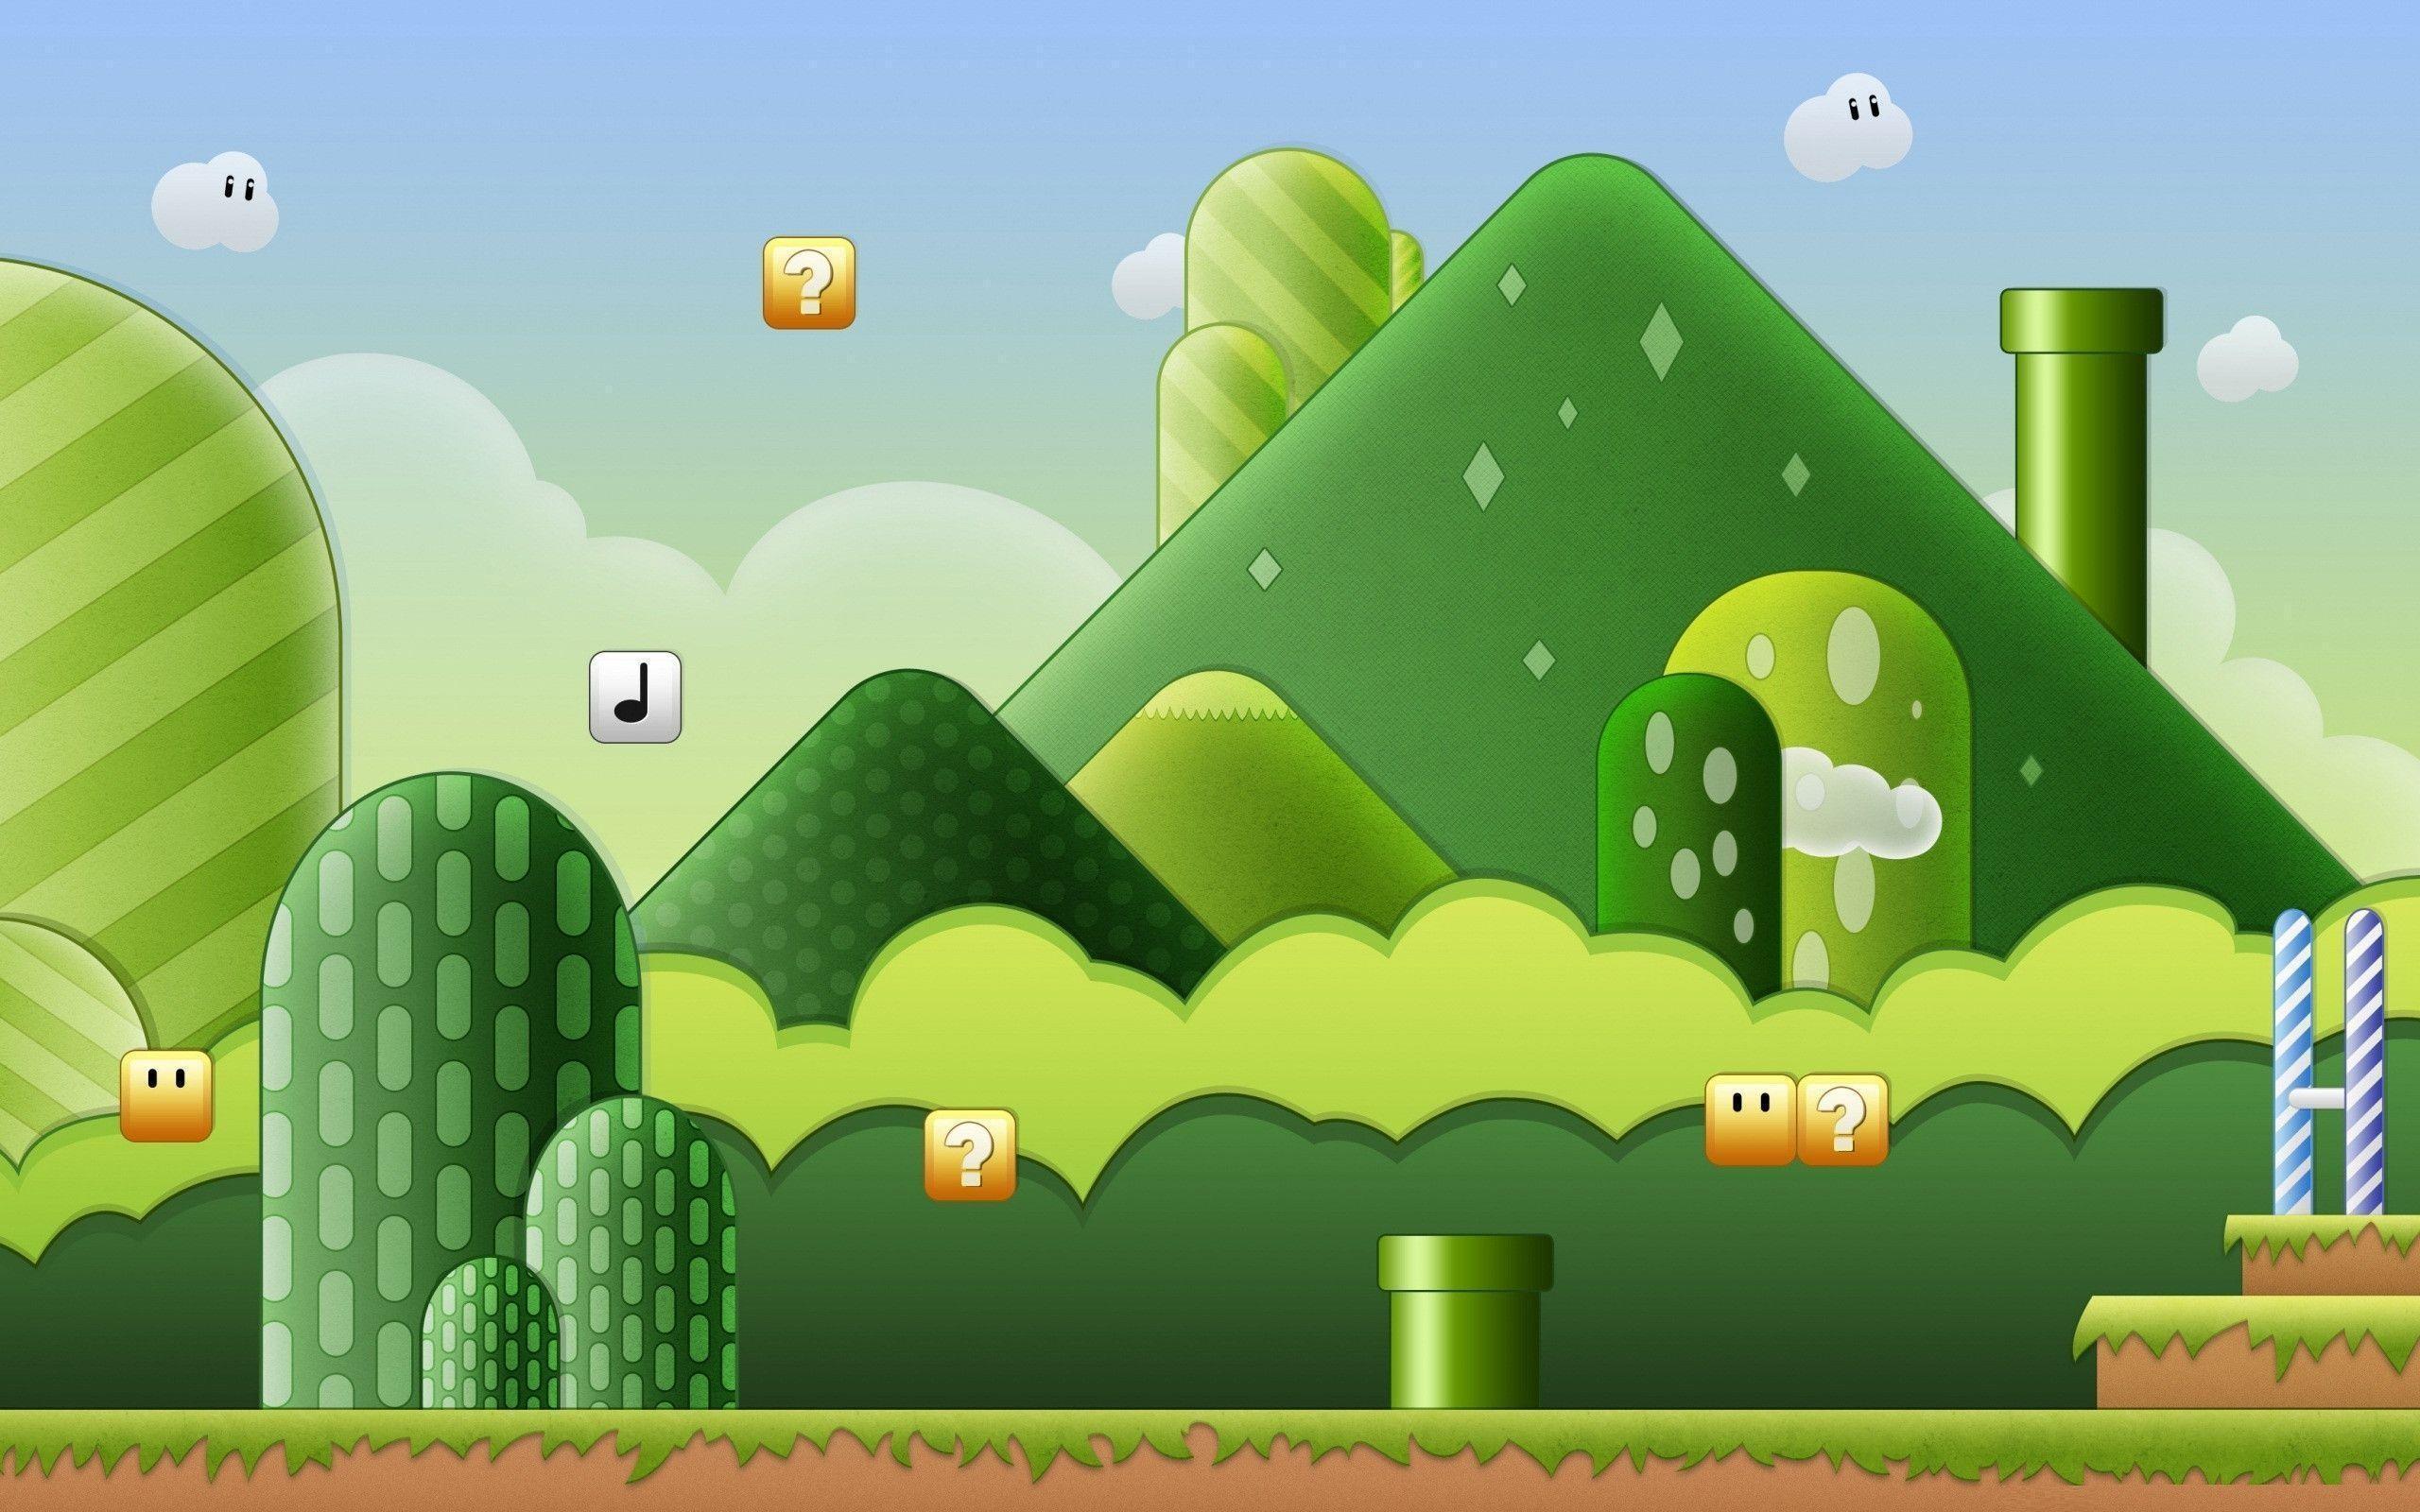 Super Mario Wallpapers – Full HD wallpaper search